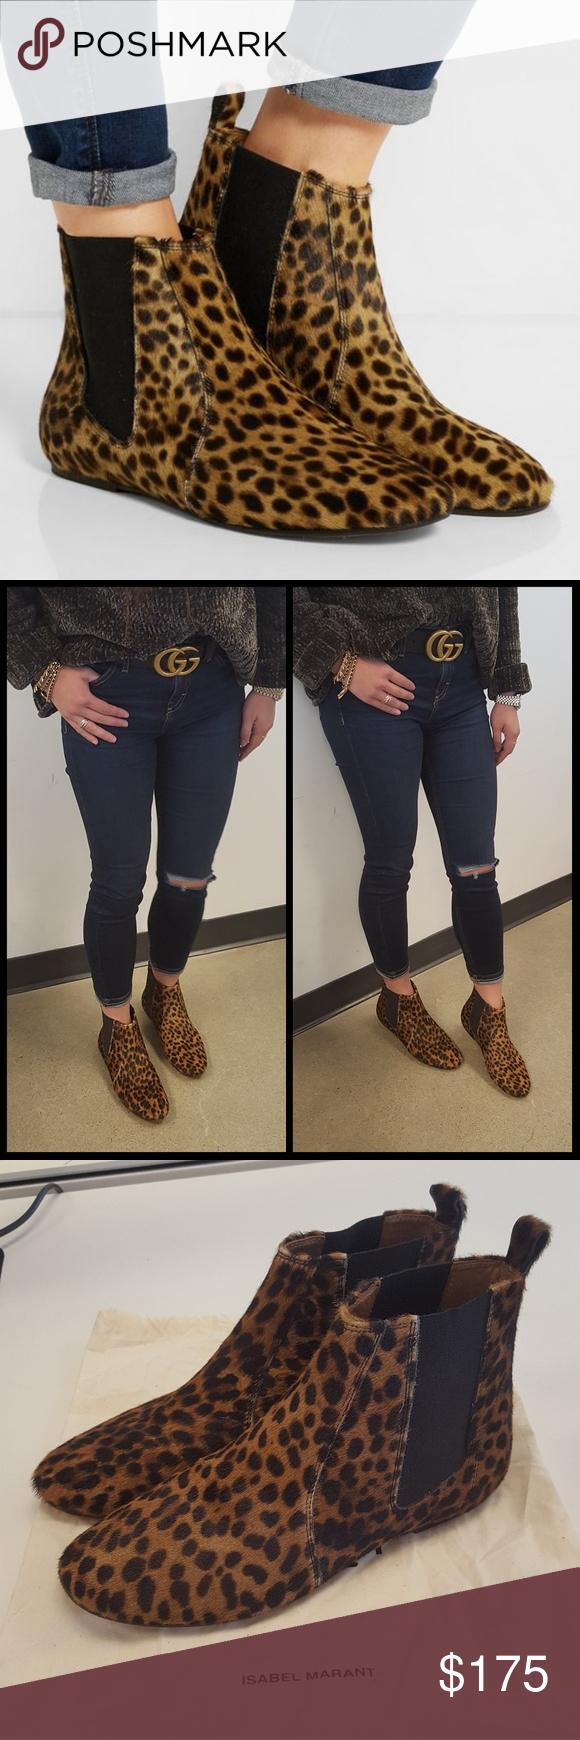 ba7585b4651 Isabel Marant Ankle Boots Authentic and super cute Isabel Marant Etoile Dewar  Leopard-print calf